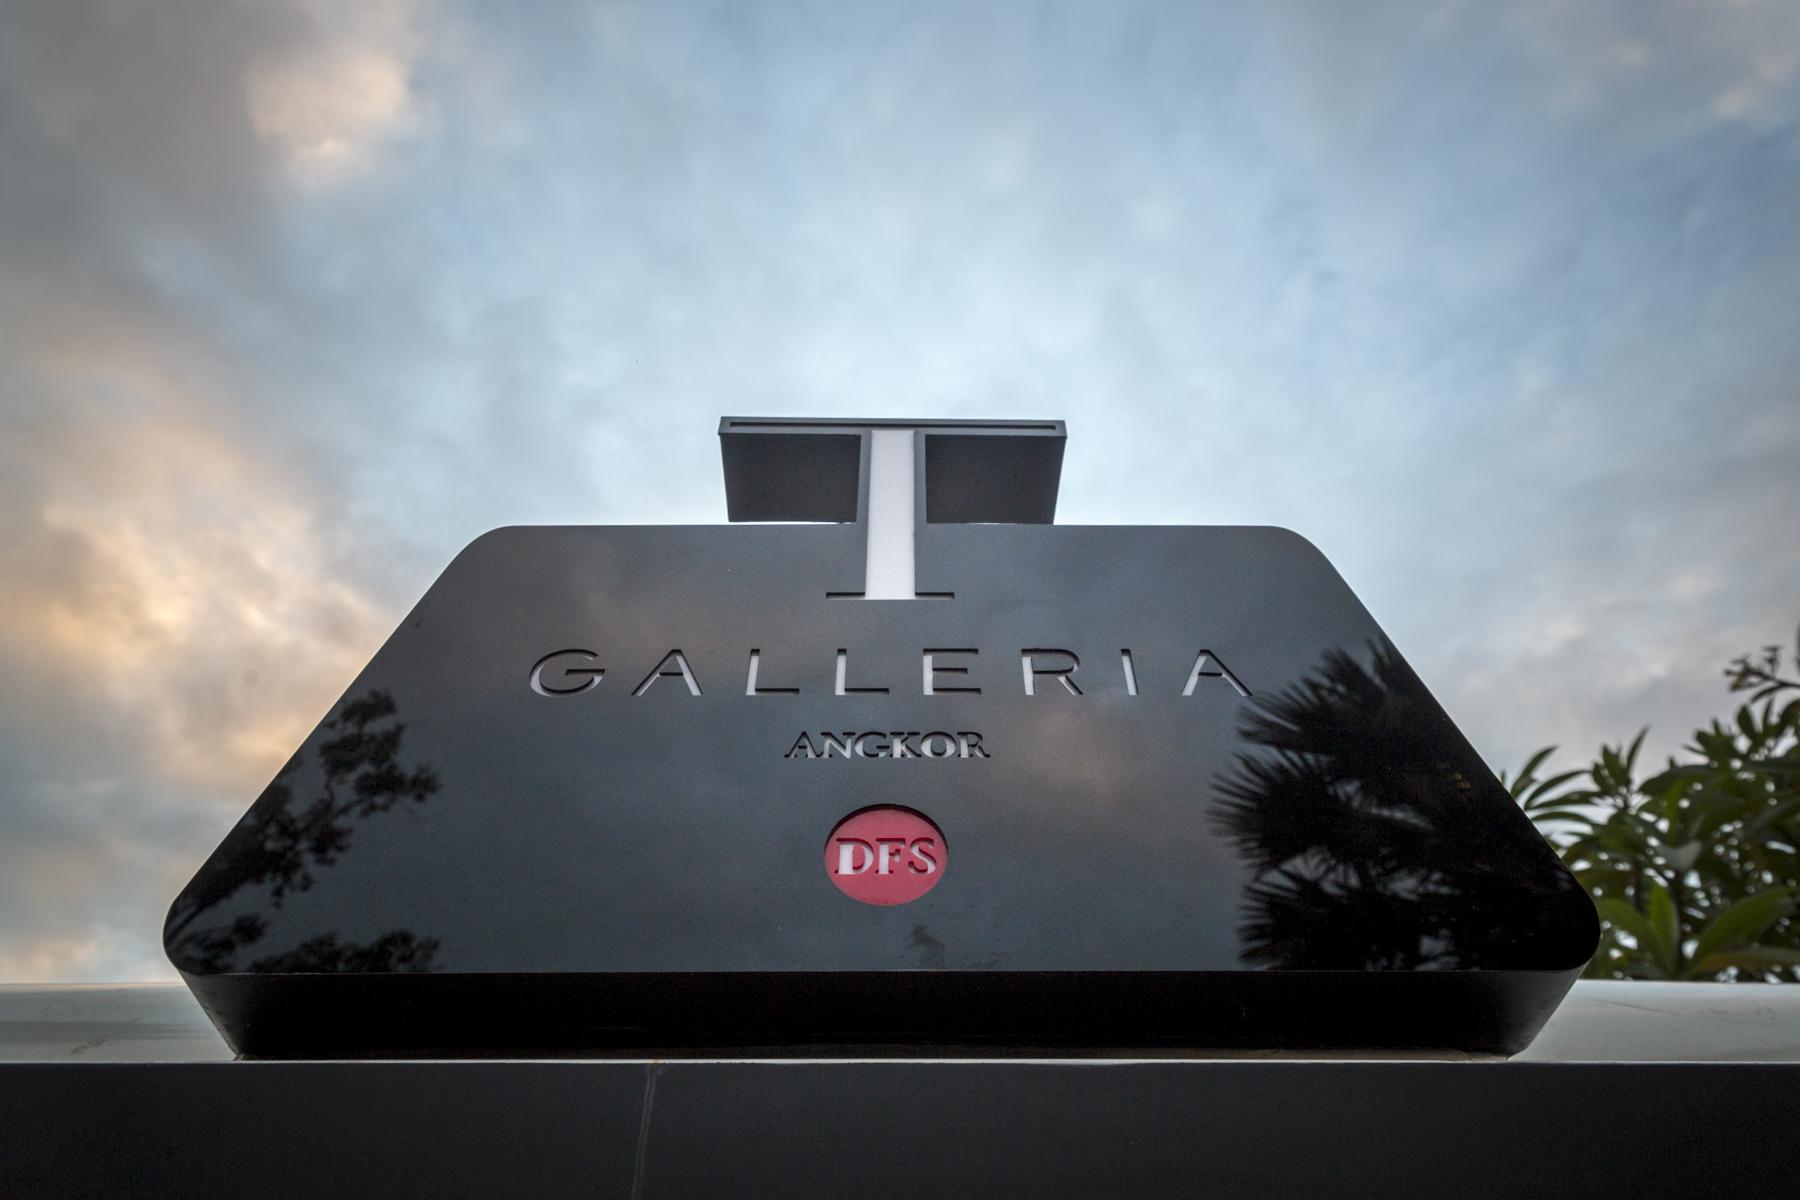 2017-12-21 DFS T-Galleria Christmas Event-0042.jpg